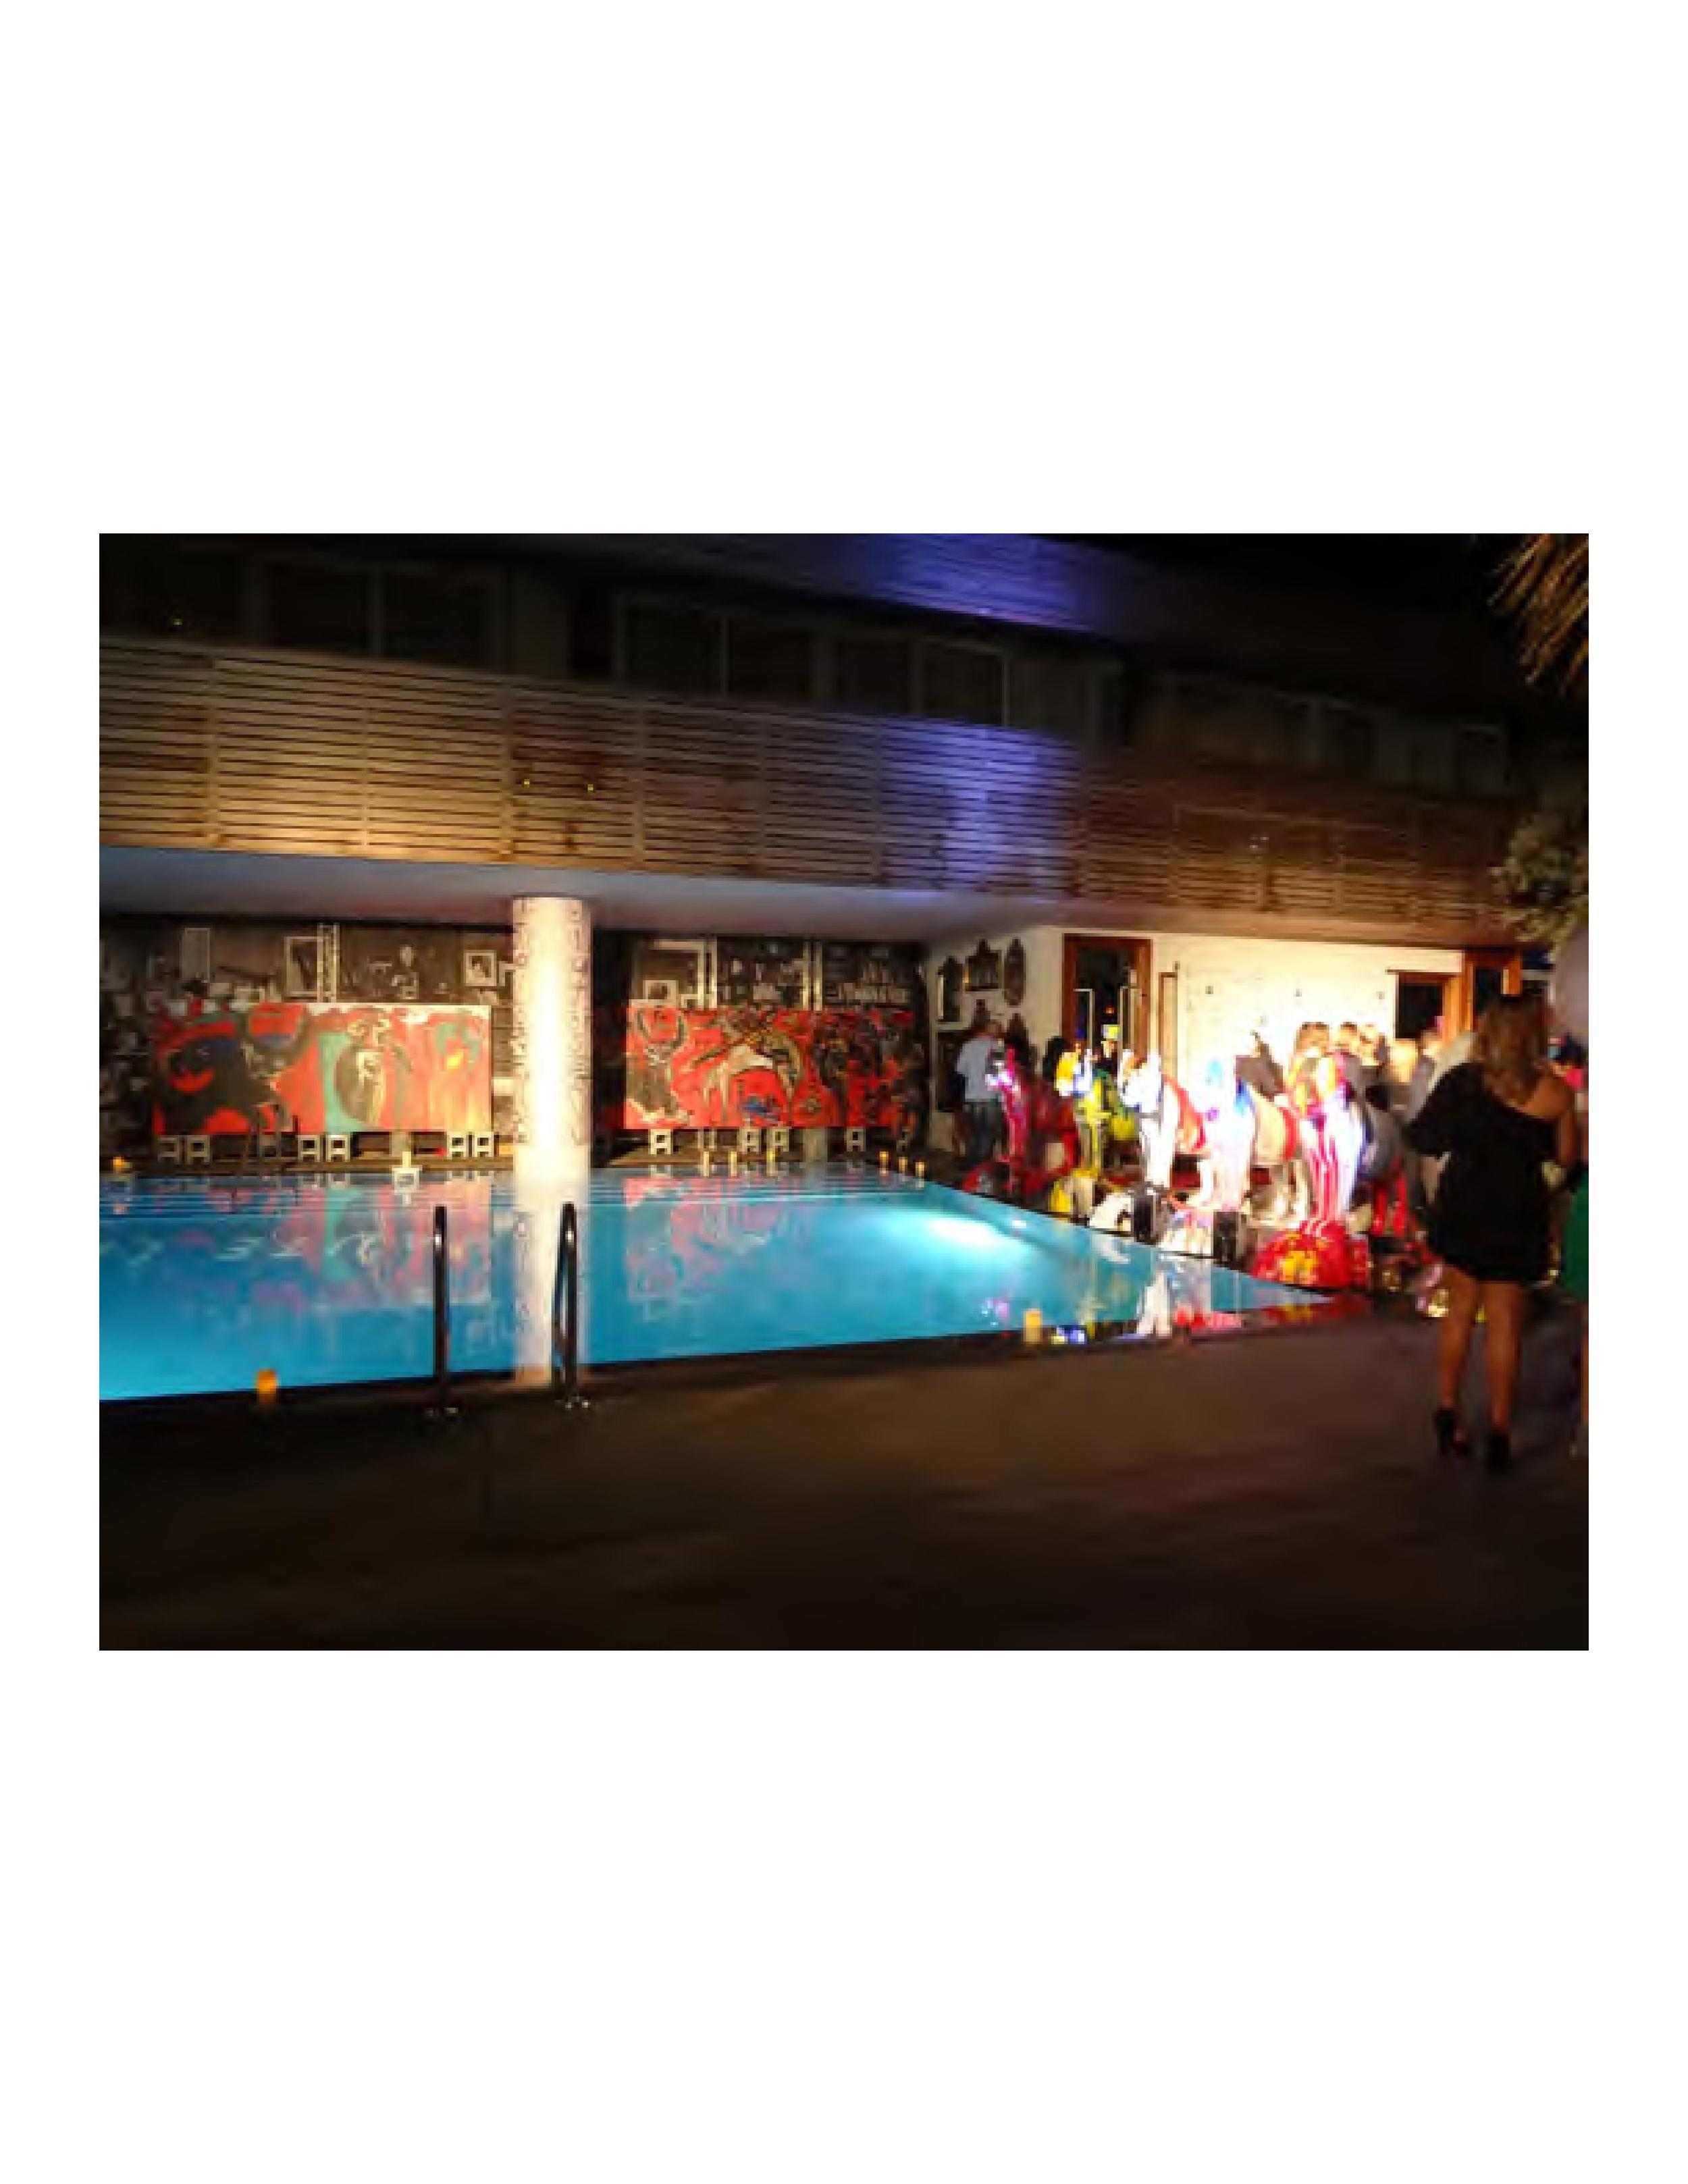 Miami_Art_Basel_Photographs-web-page-091.jpg